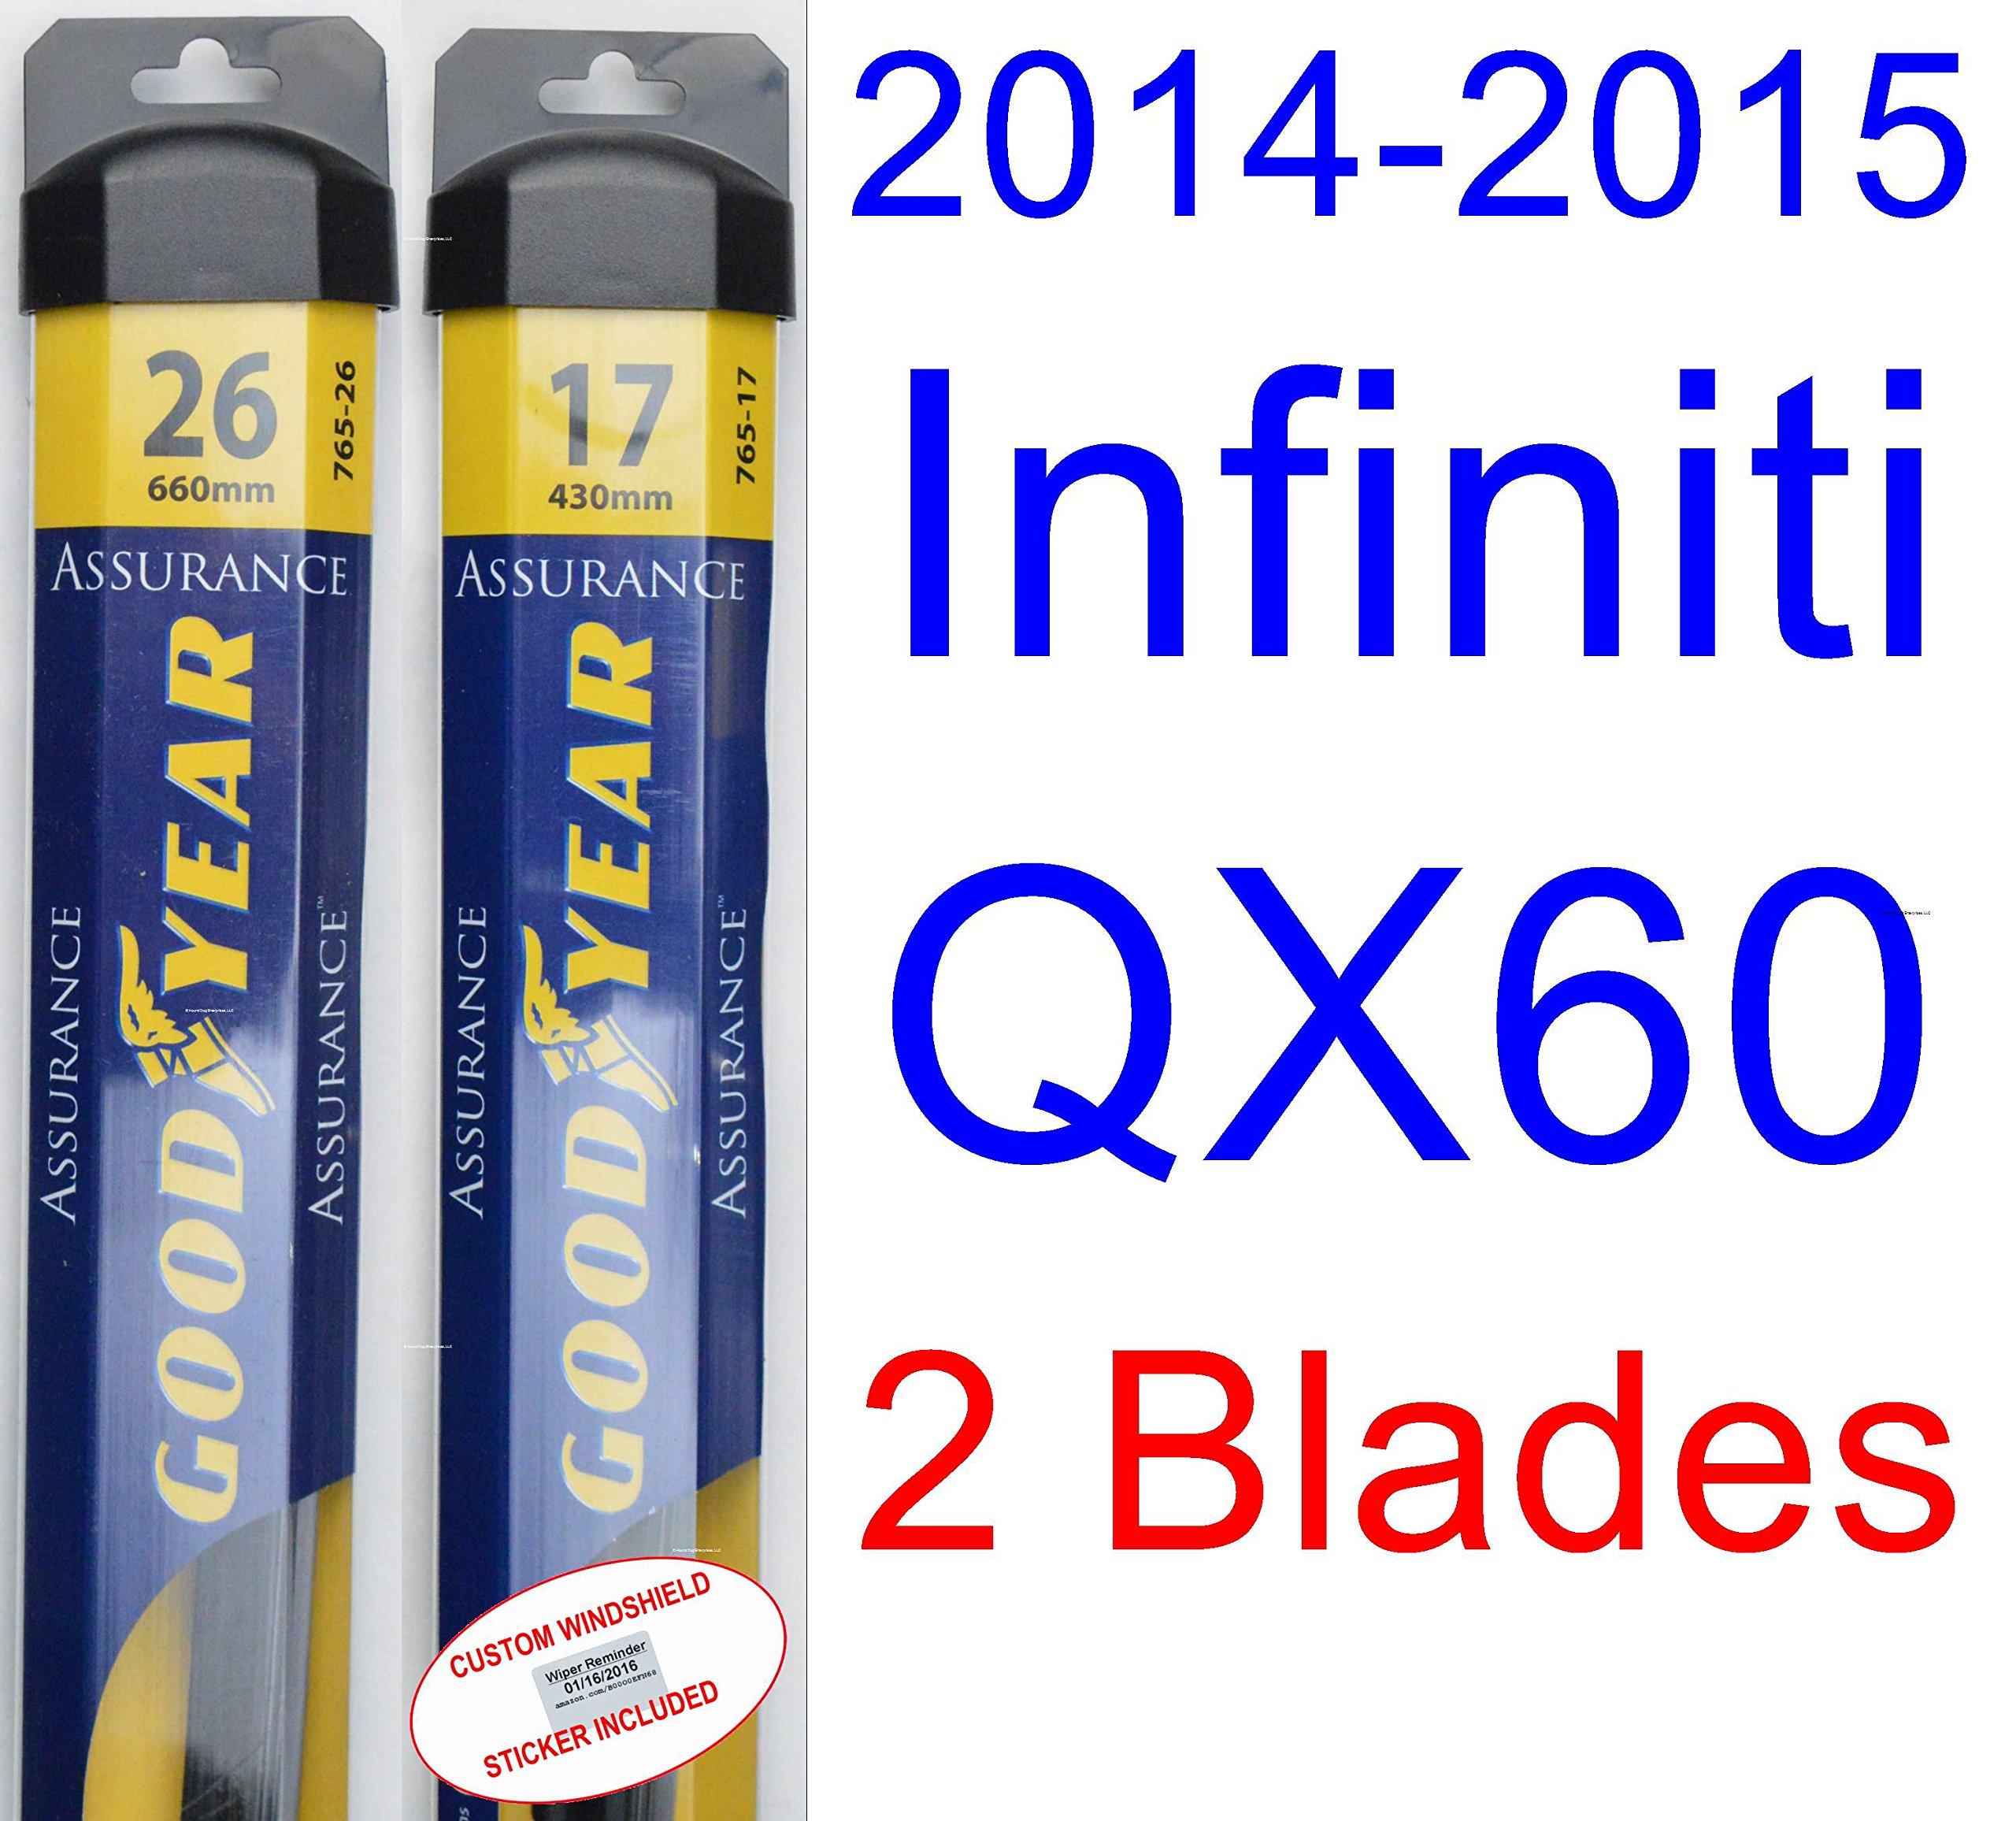 2014-2015 Infiniti QX60 Replacement Wiper Blade Set/Kit (Set of 2 Blades) (Goodyear Wiper Blades-Assurance) by Goodyear Wiper Blades